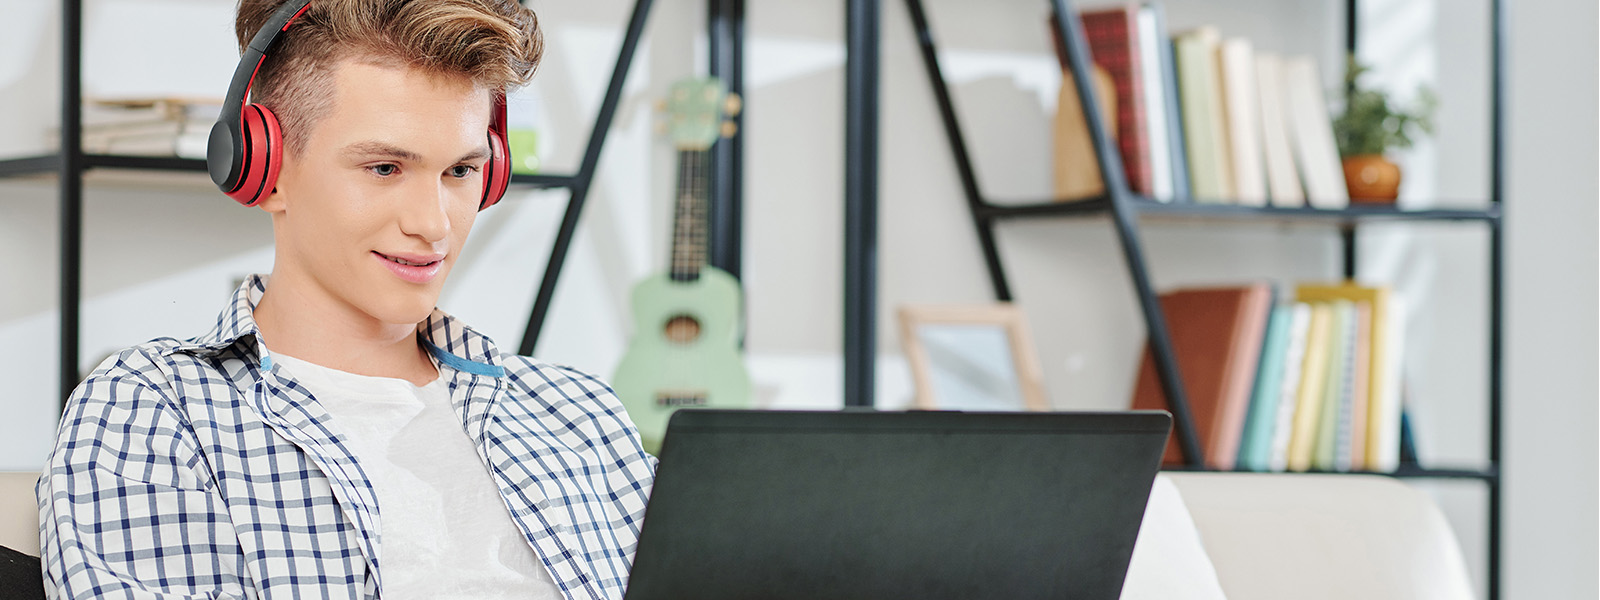 Teenage boy on couch wearing headphones working on laptop